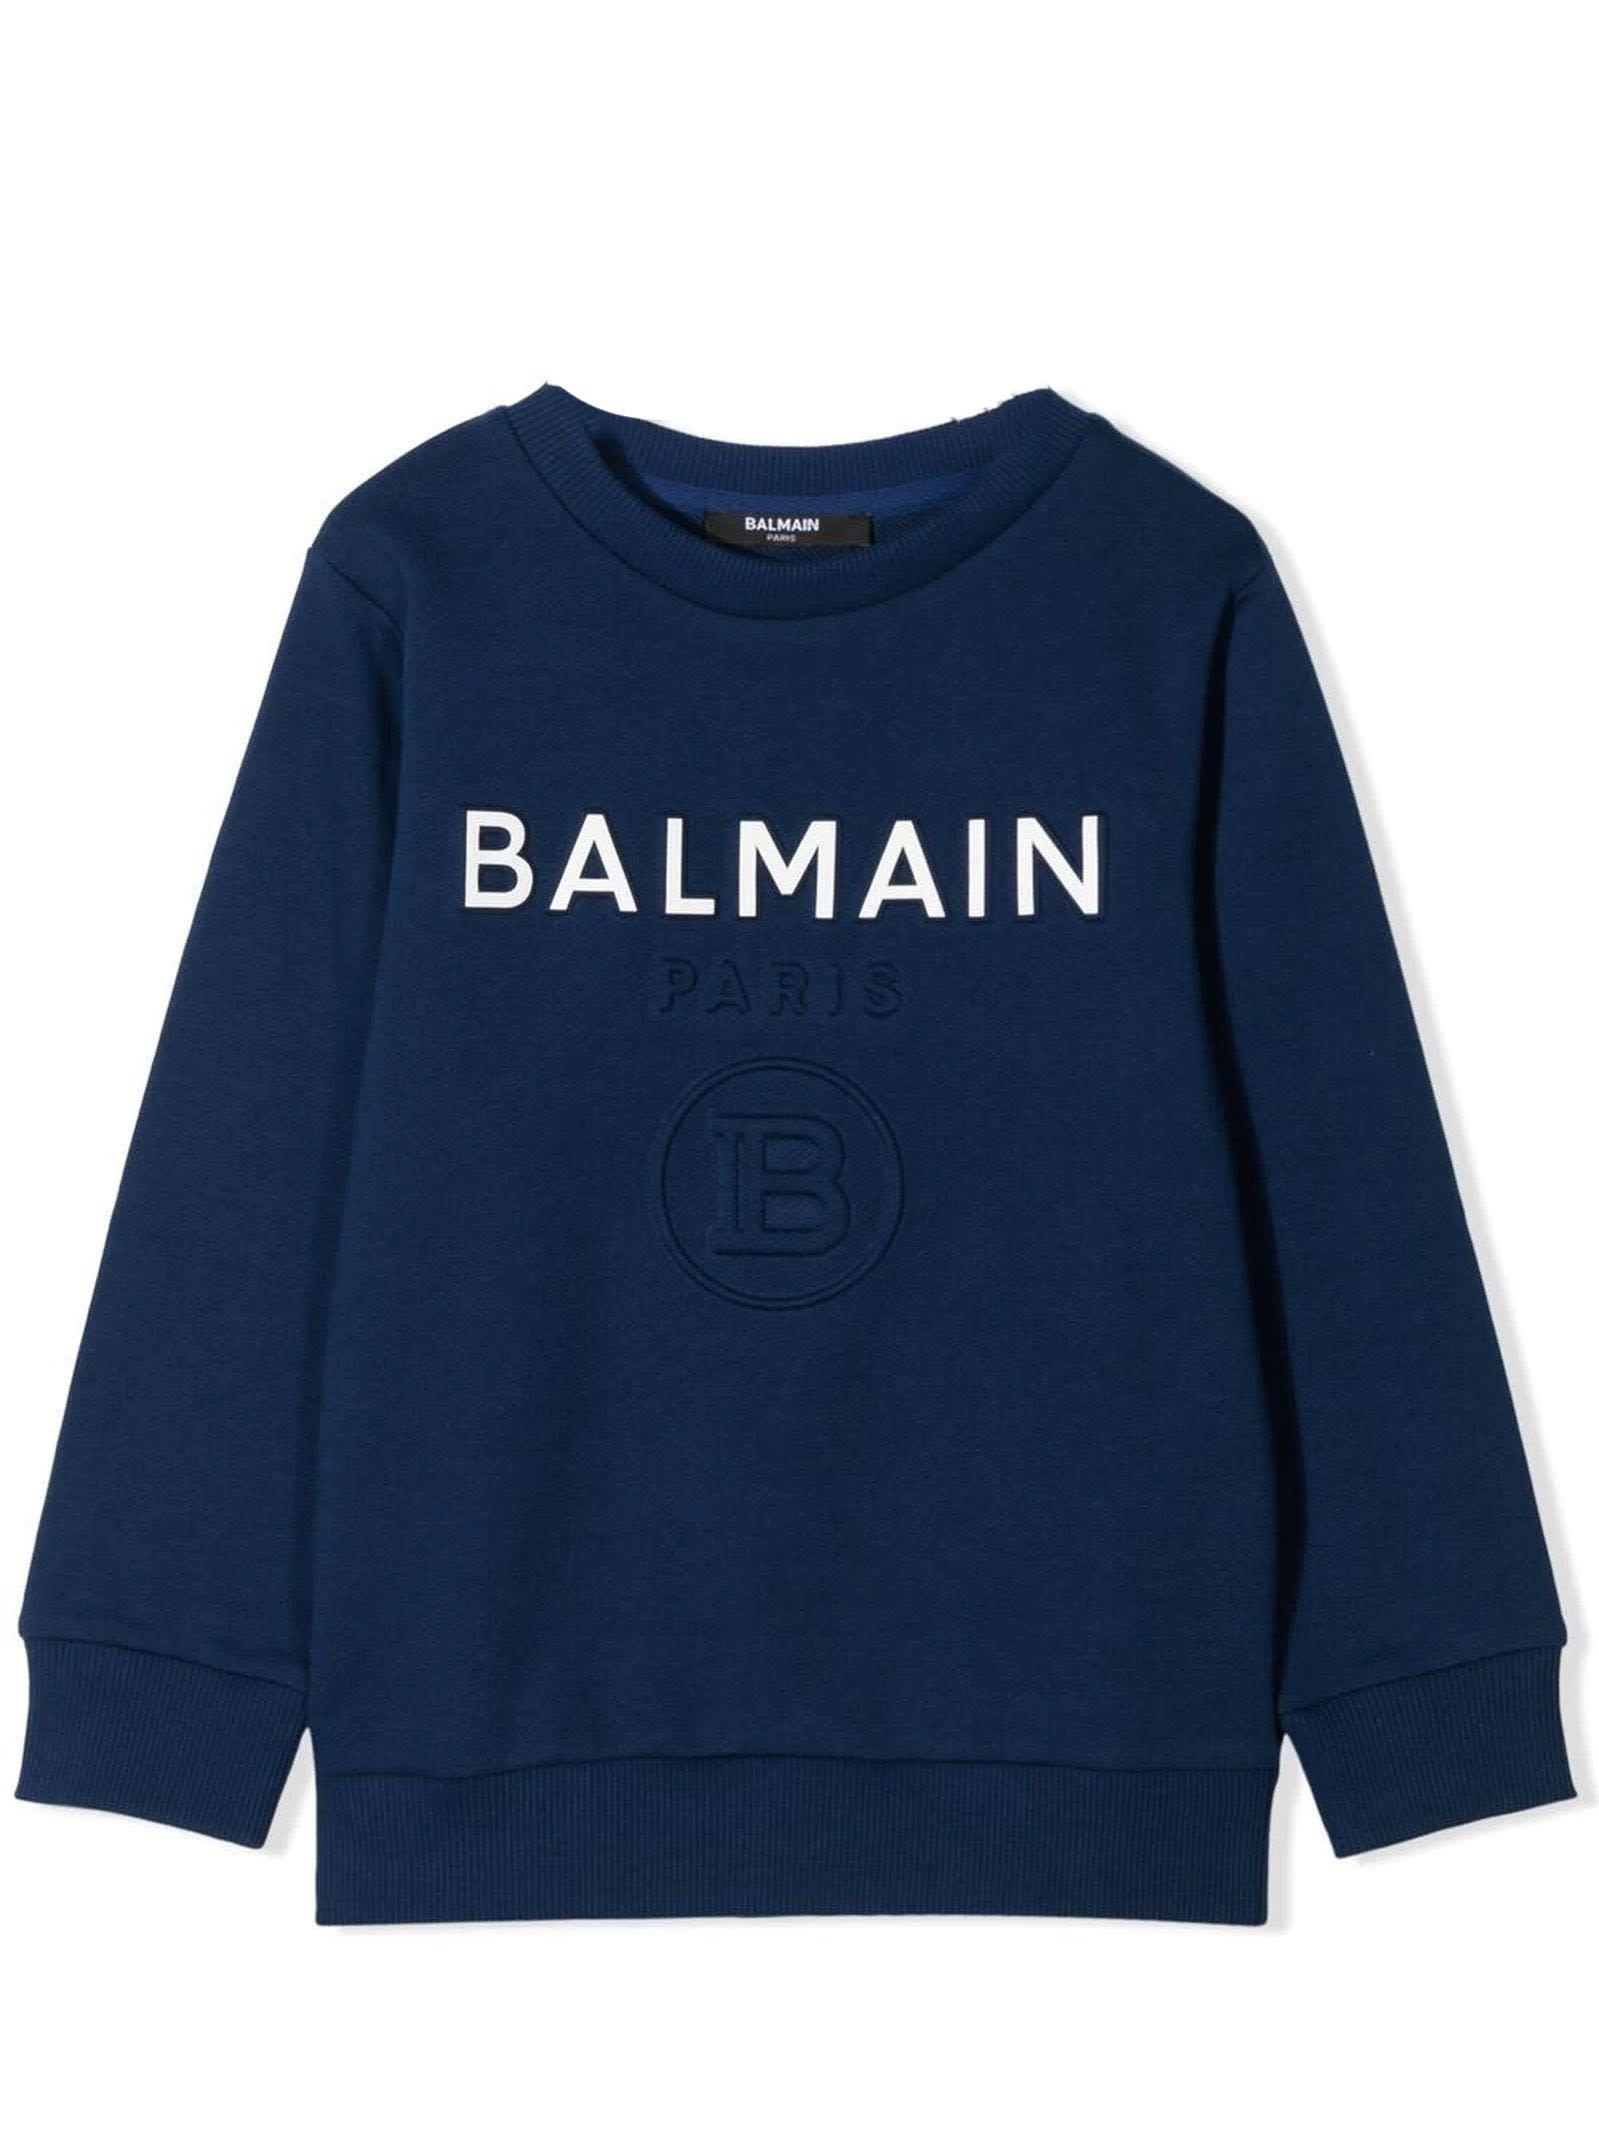 Balmain Blue Cotton Sweatshirt